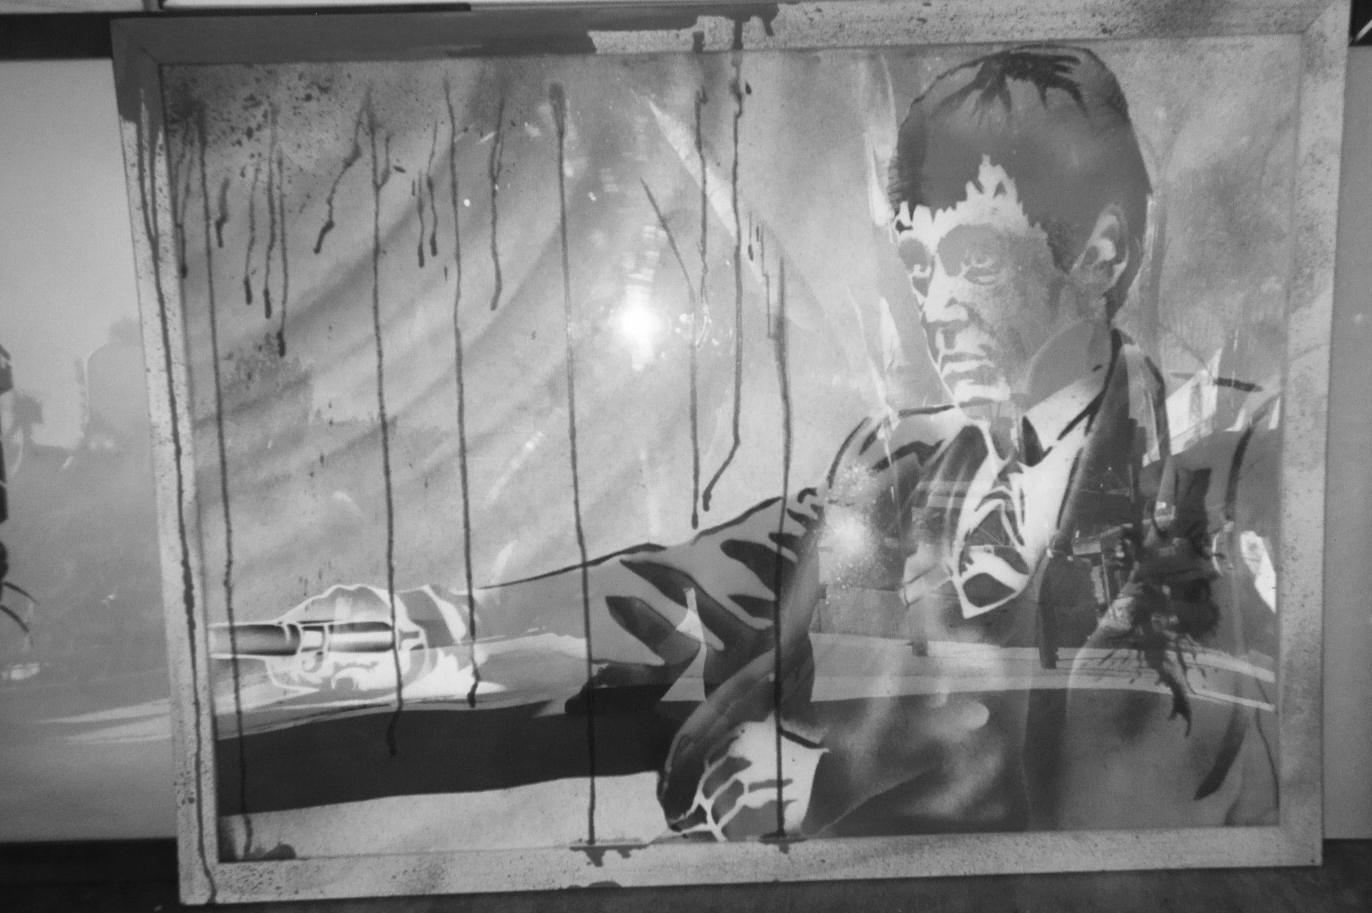 scarface as an entrepreneur essay Scarface (the movie) essaysstars: al picino, steven bauer, michelle pfeiffer,  mary elizabeth mastrantonio, robert loggia al pacino gives an unforgettable.